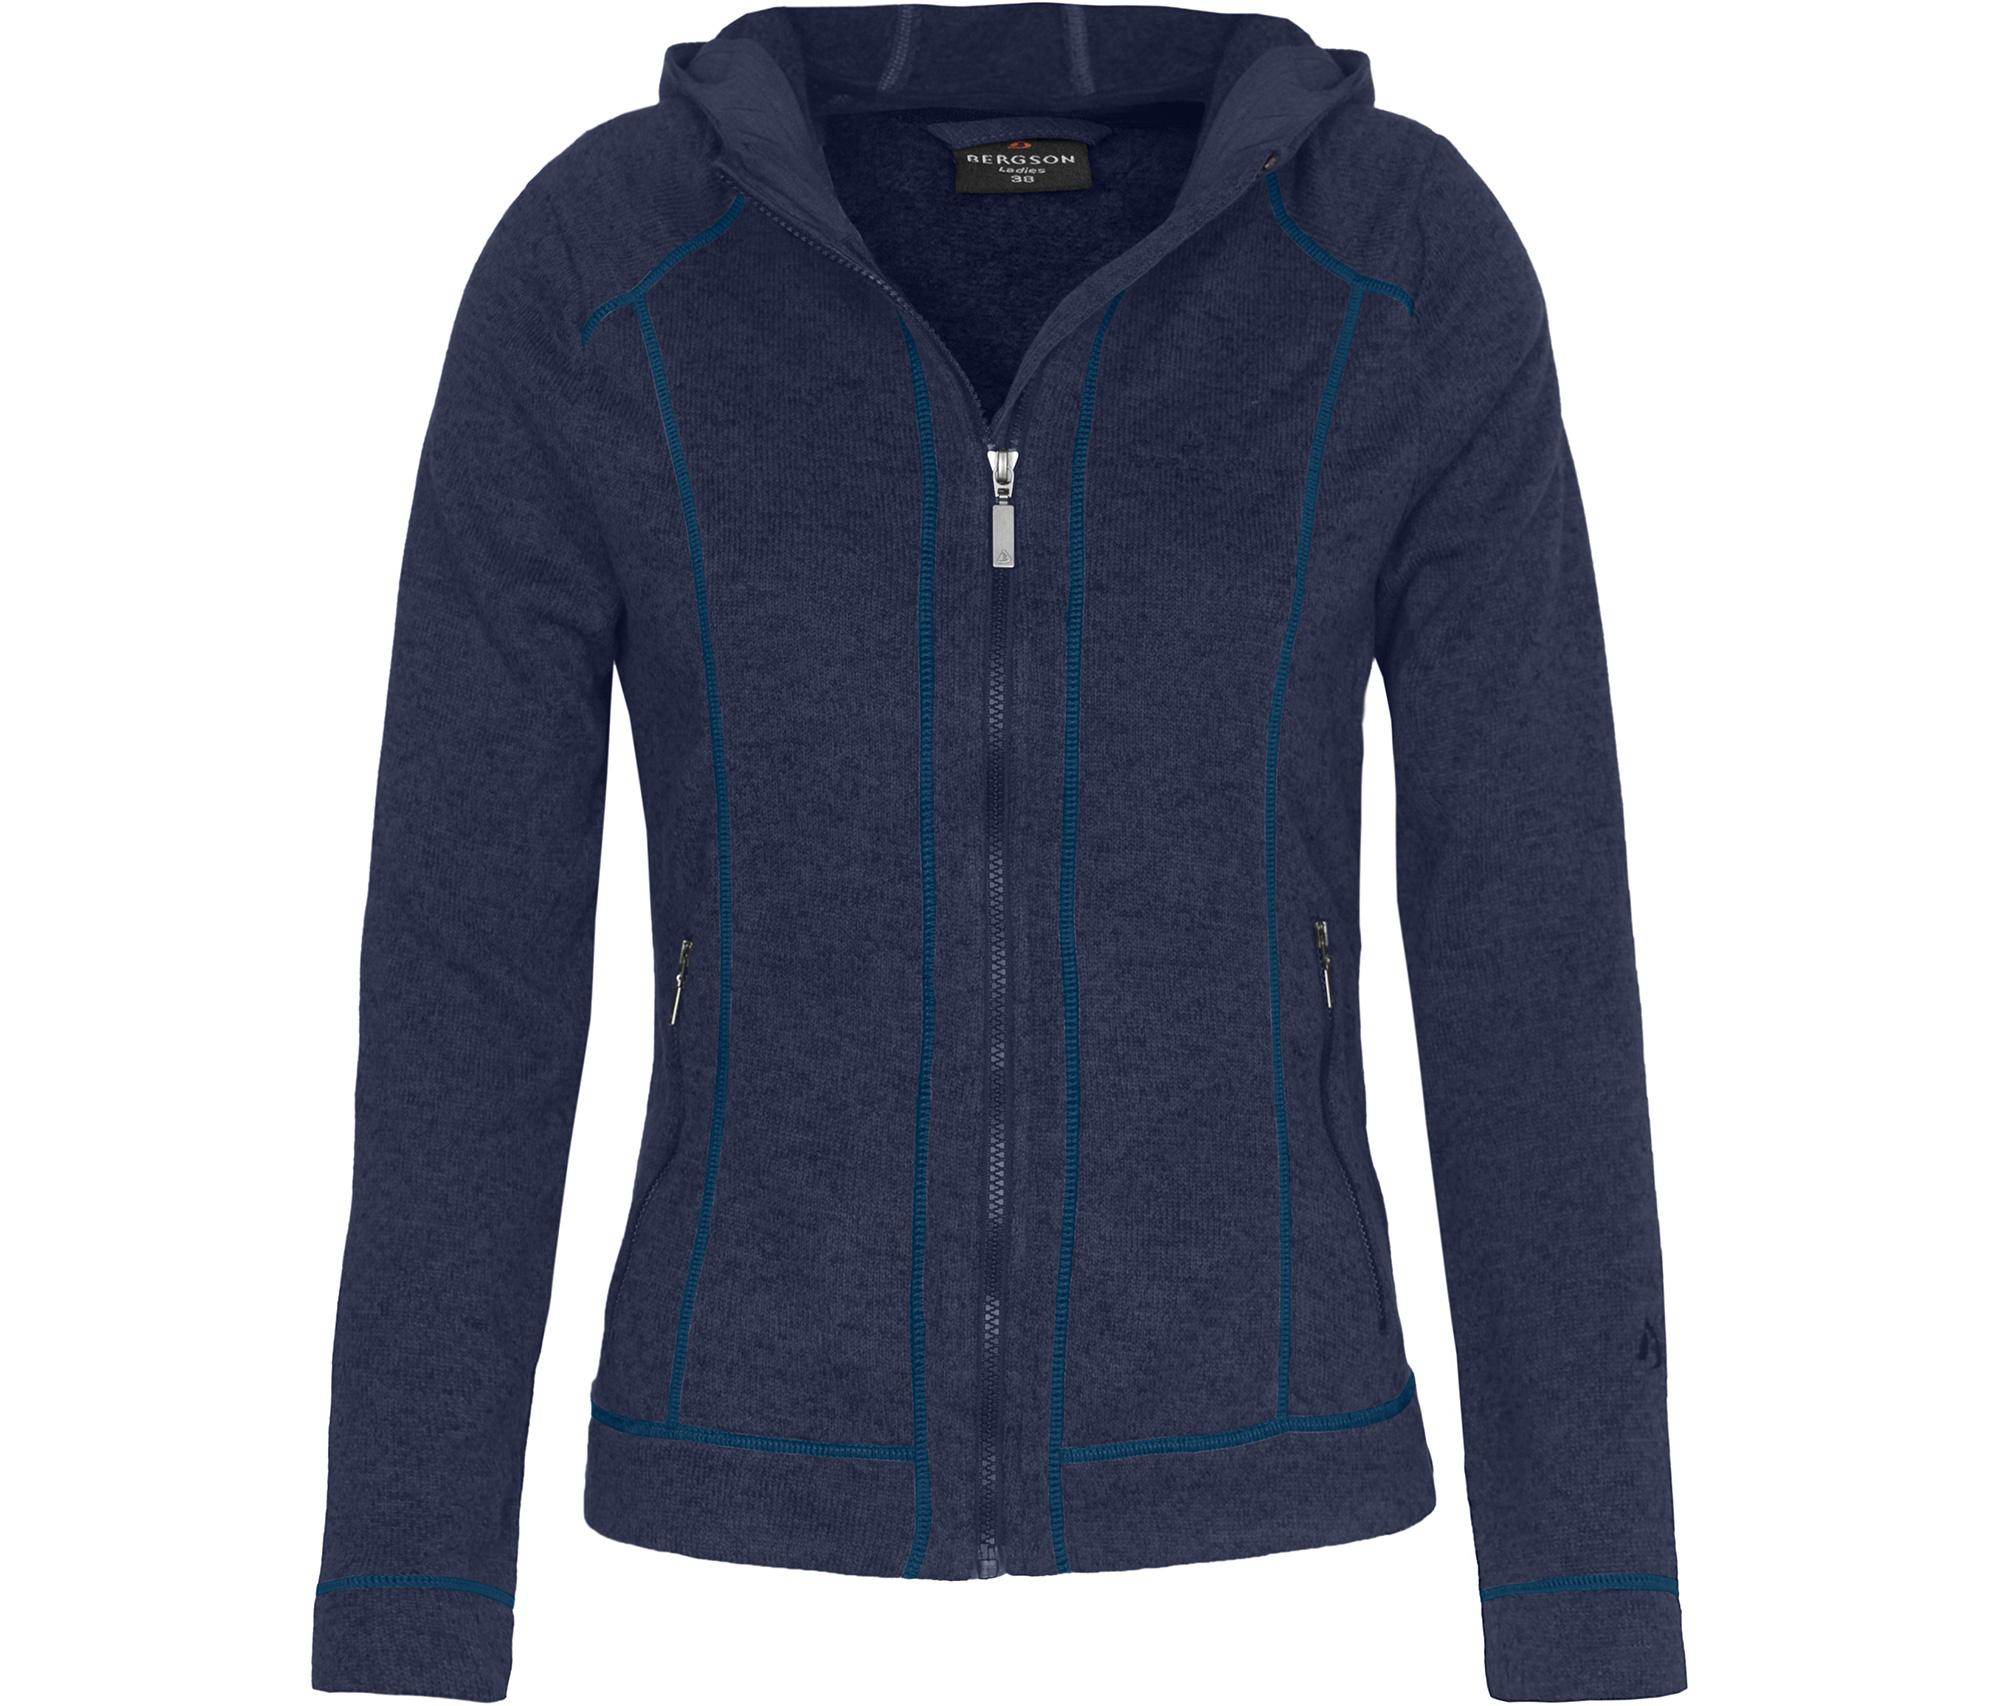 blaue fleece jacke damen